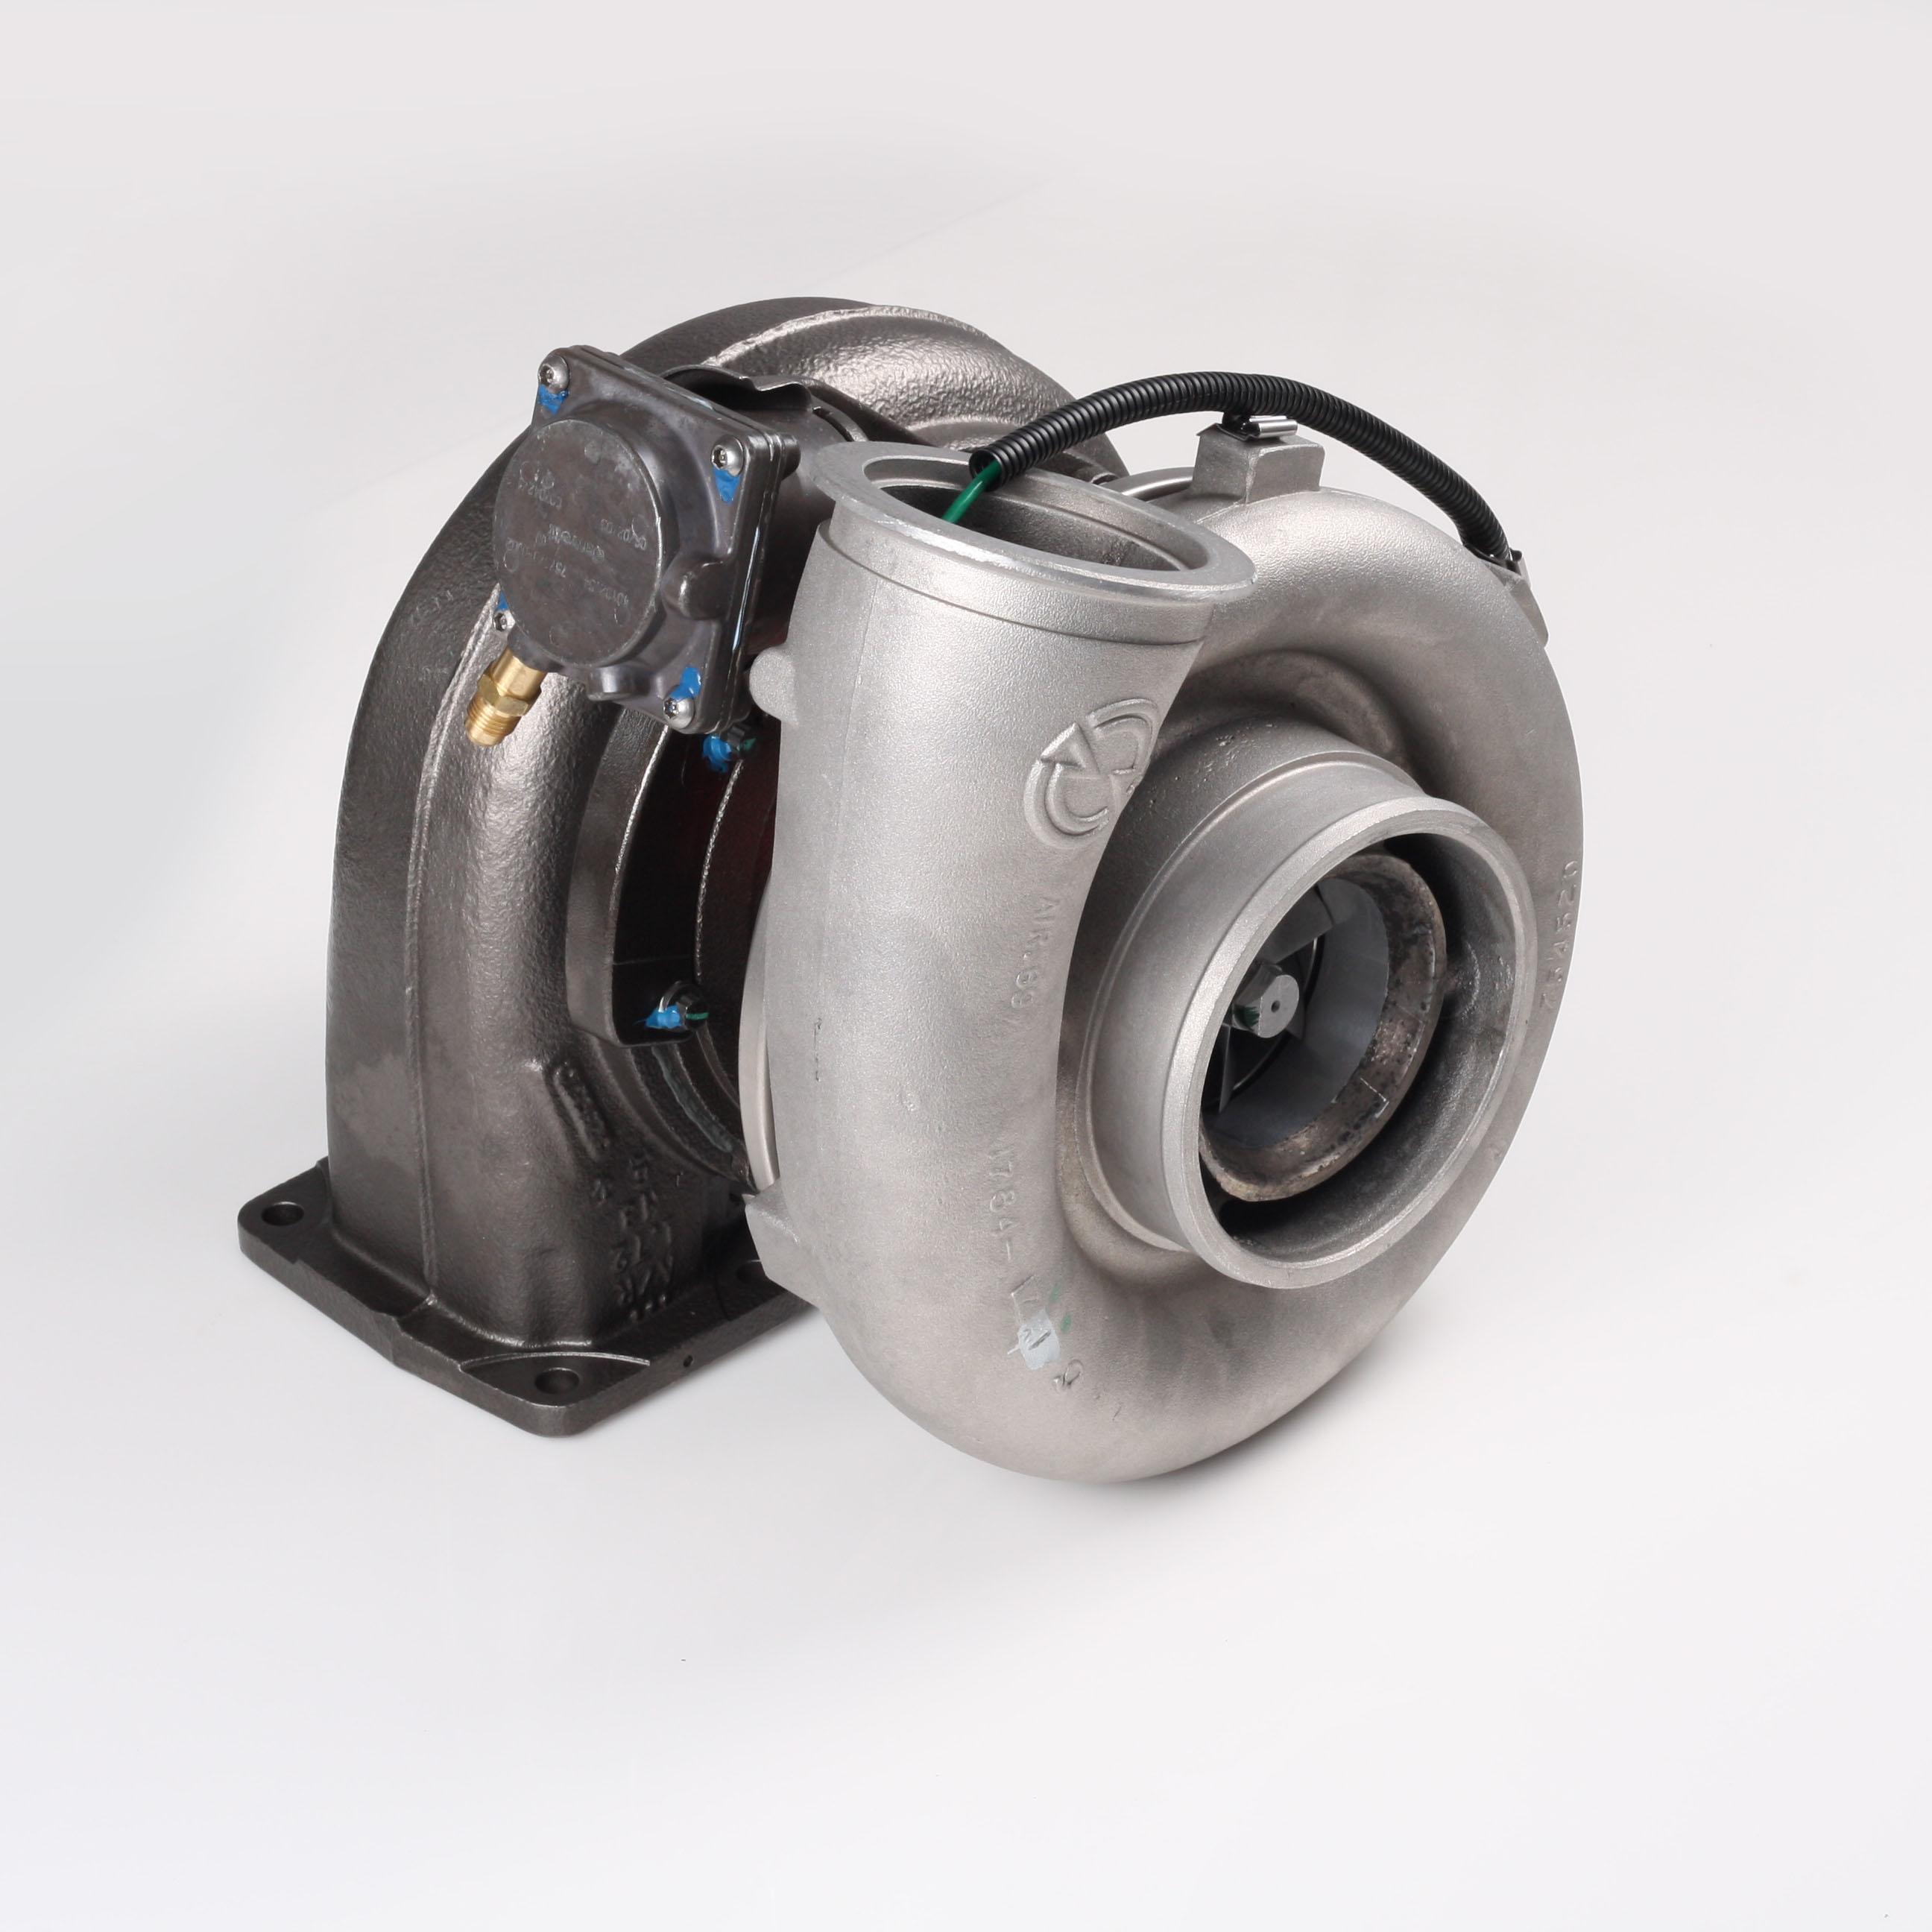 Detroit Diesel Series 60 Turbocharger 758204-9006